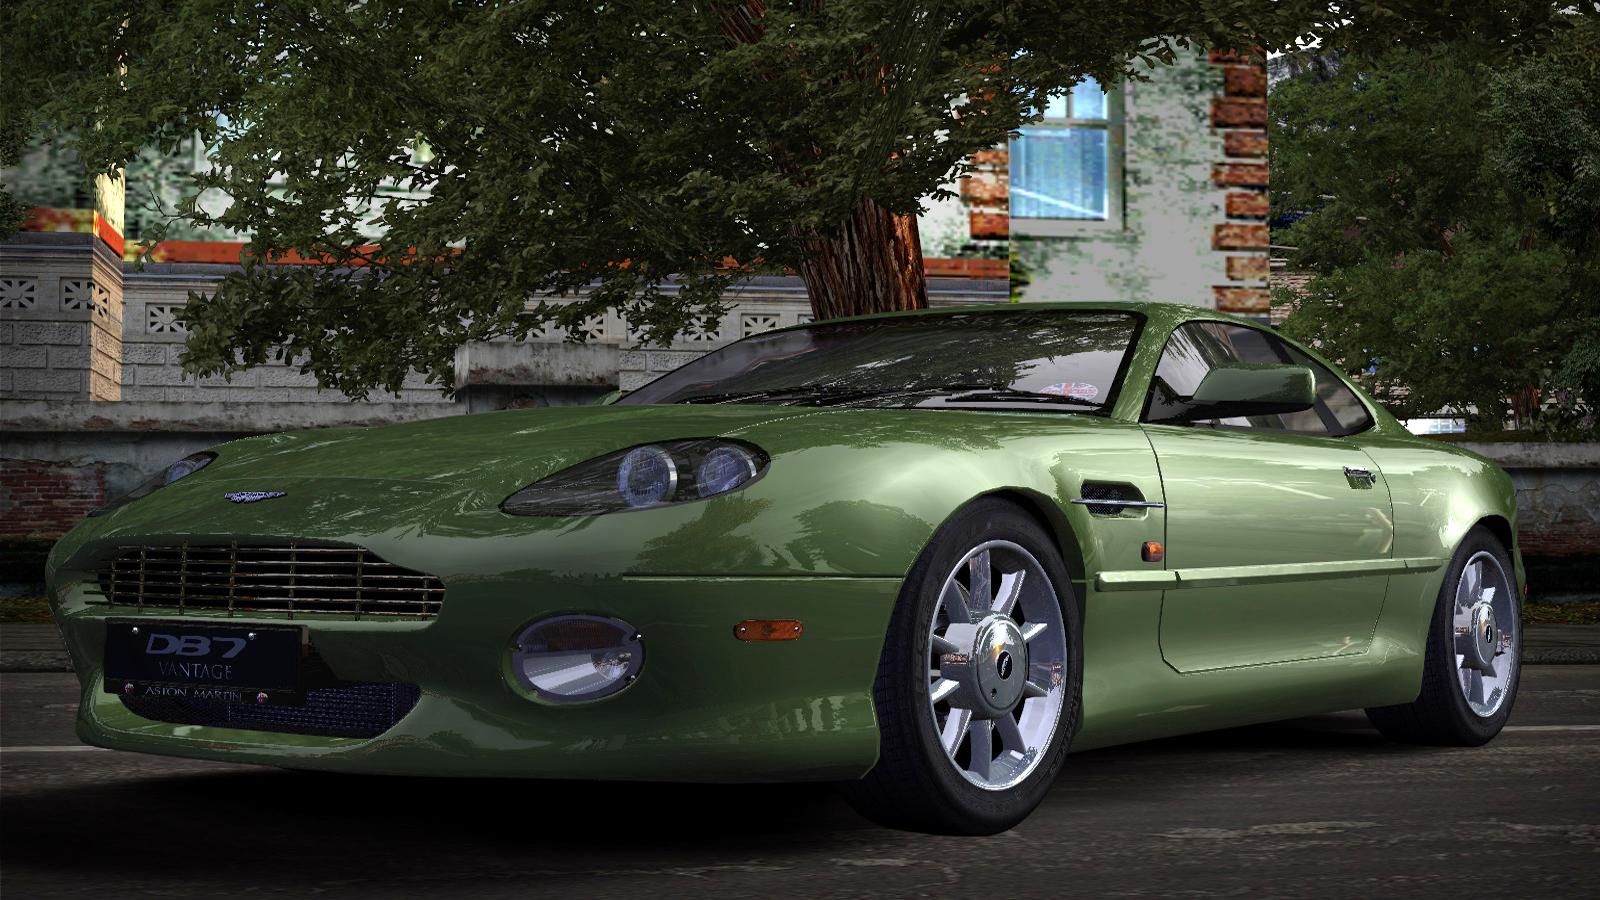 Speed 2020-01-05 18-57-18-245.jpg - Need for Speed: Most Wanted (2005) Aston Martin DB7 Vantage, Автомобиль